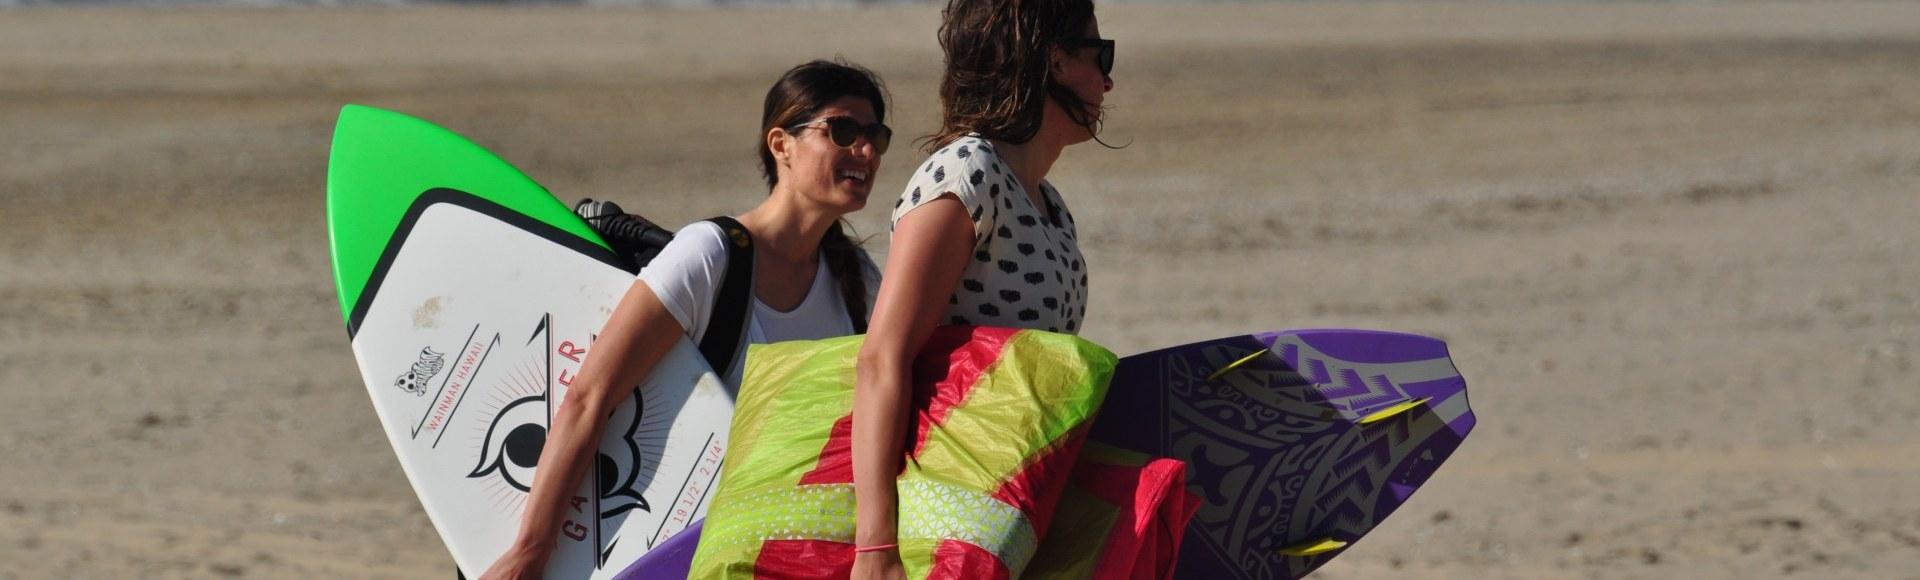 Kite gear stalling Bloemendaal aan Zee